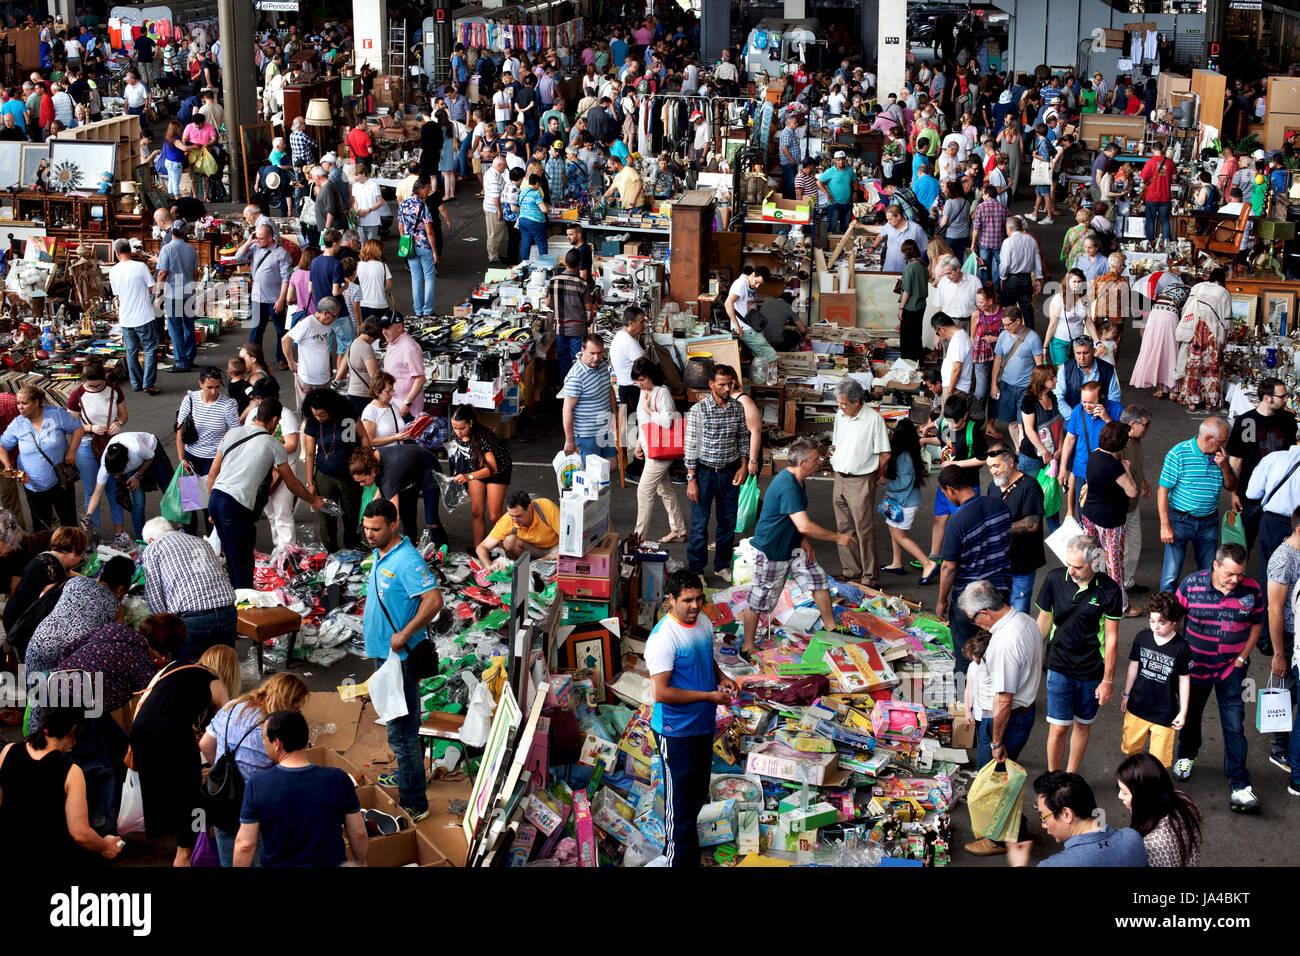 Encants market, Barcelona, Spain. - Stock Image